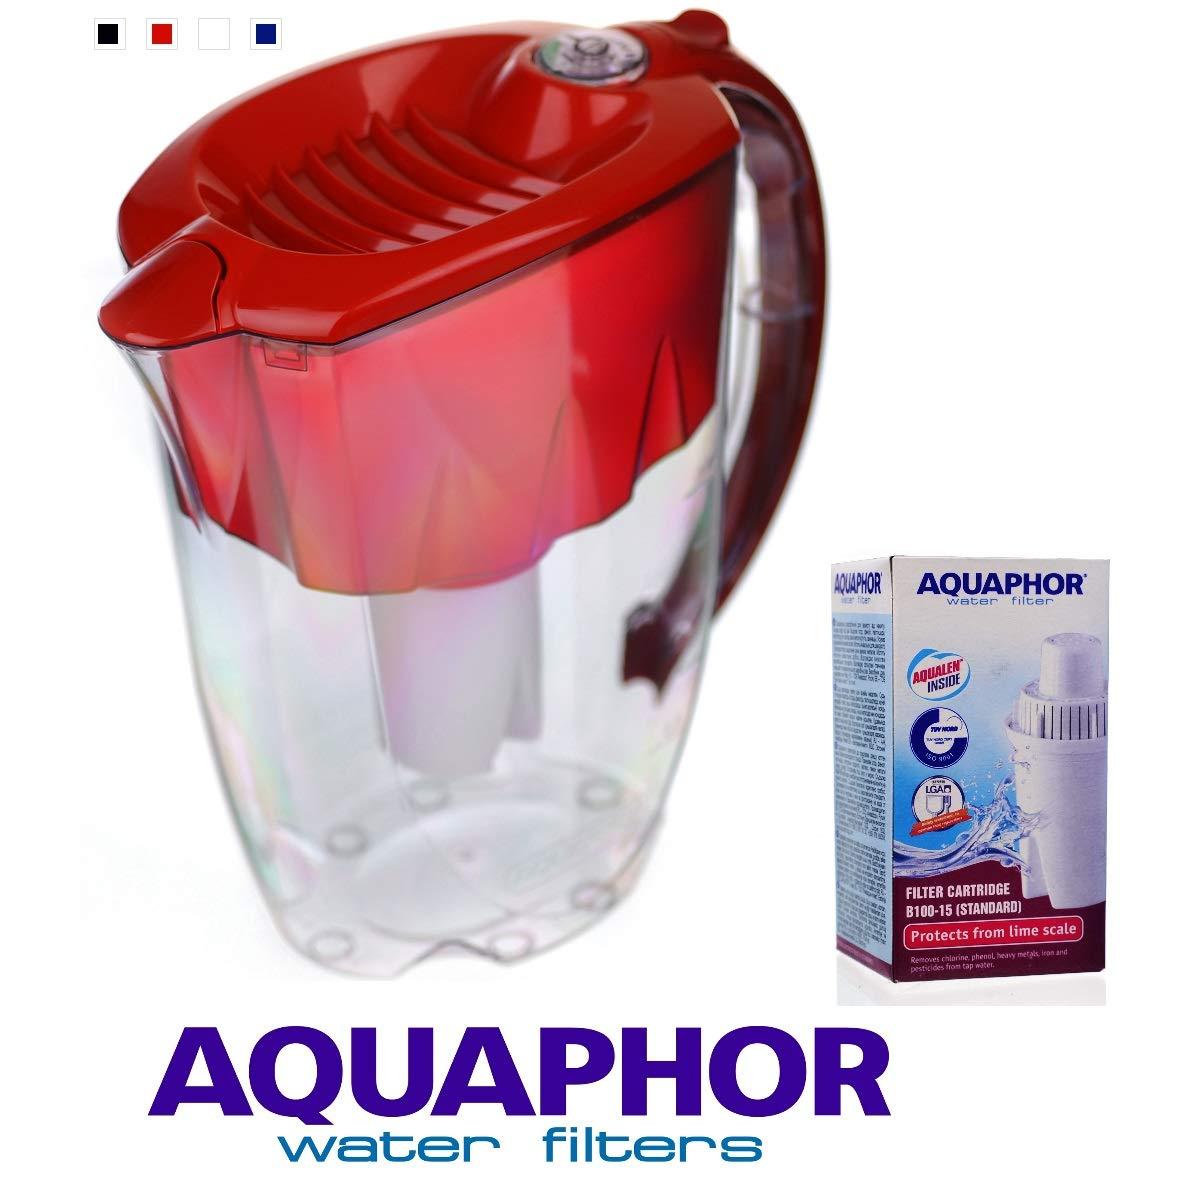 Aquaphor ideale Ruby caraffa filtrante 2.8l e 1+ 6cartucce di Classic 170l Prezzi